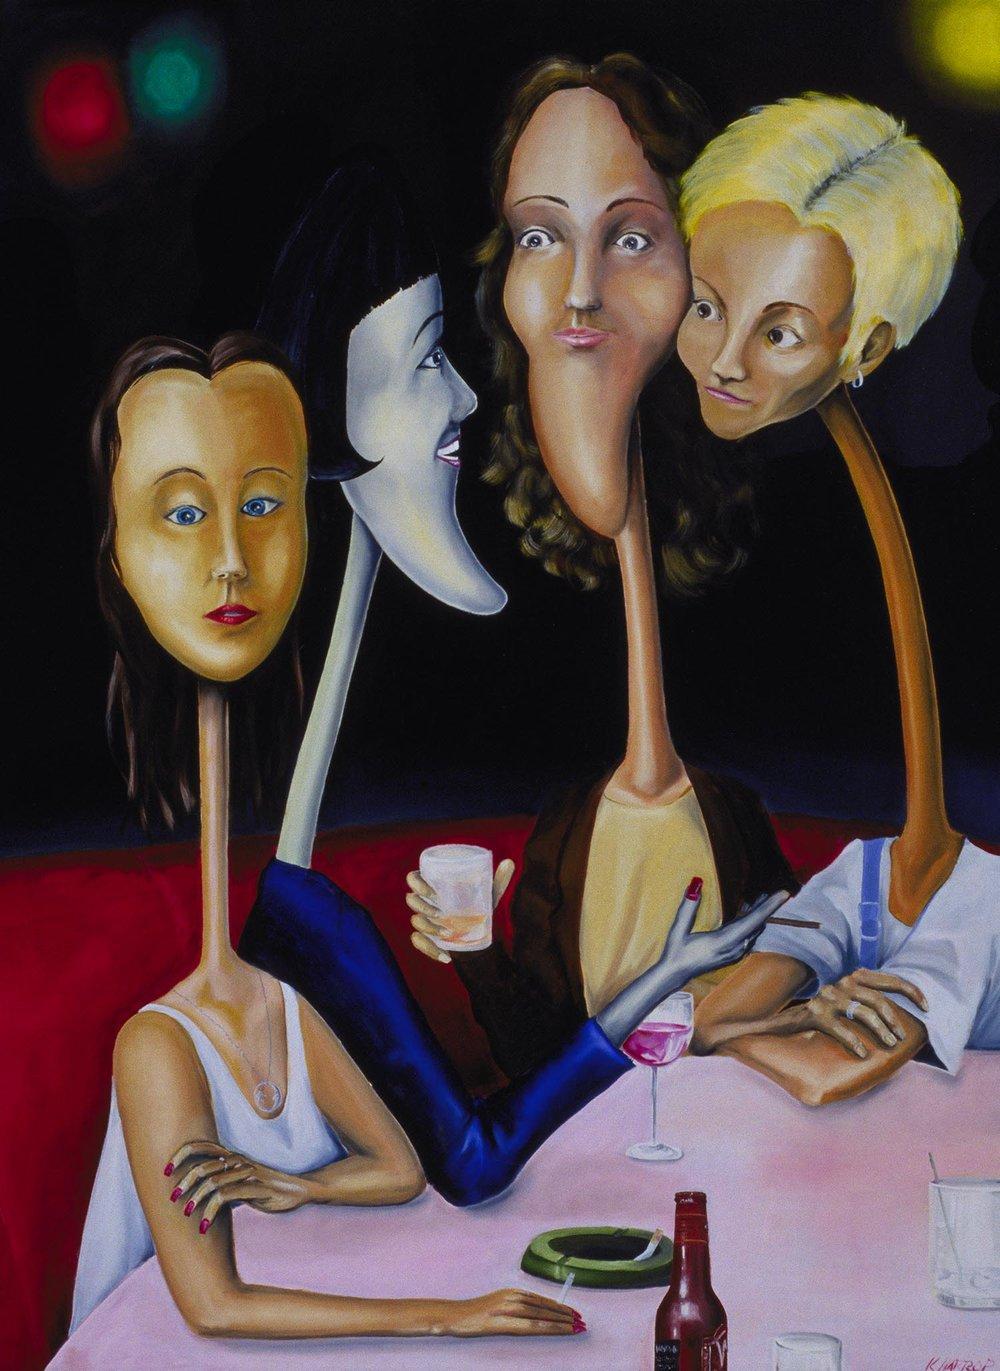 Waited So Long - Title: 'Waited So Long'Medium: Oil on canvas - Framed (Black)Size: 36